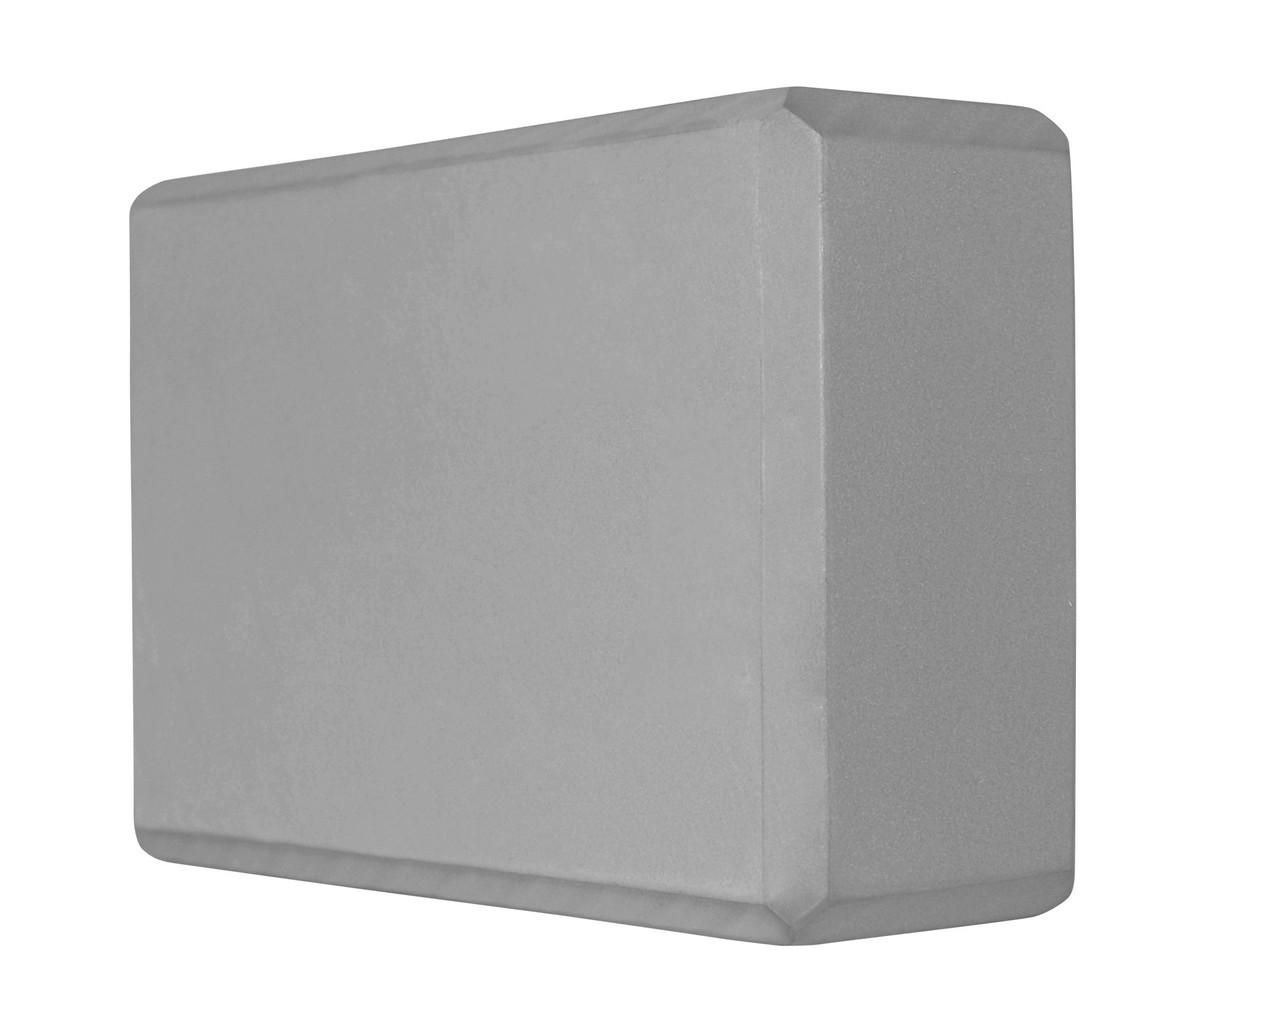 Блок для йоги Sport Shiny SV-HK0155 Grey